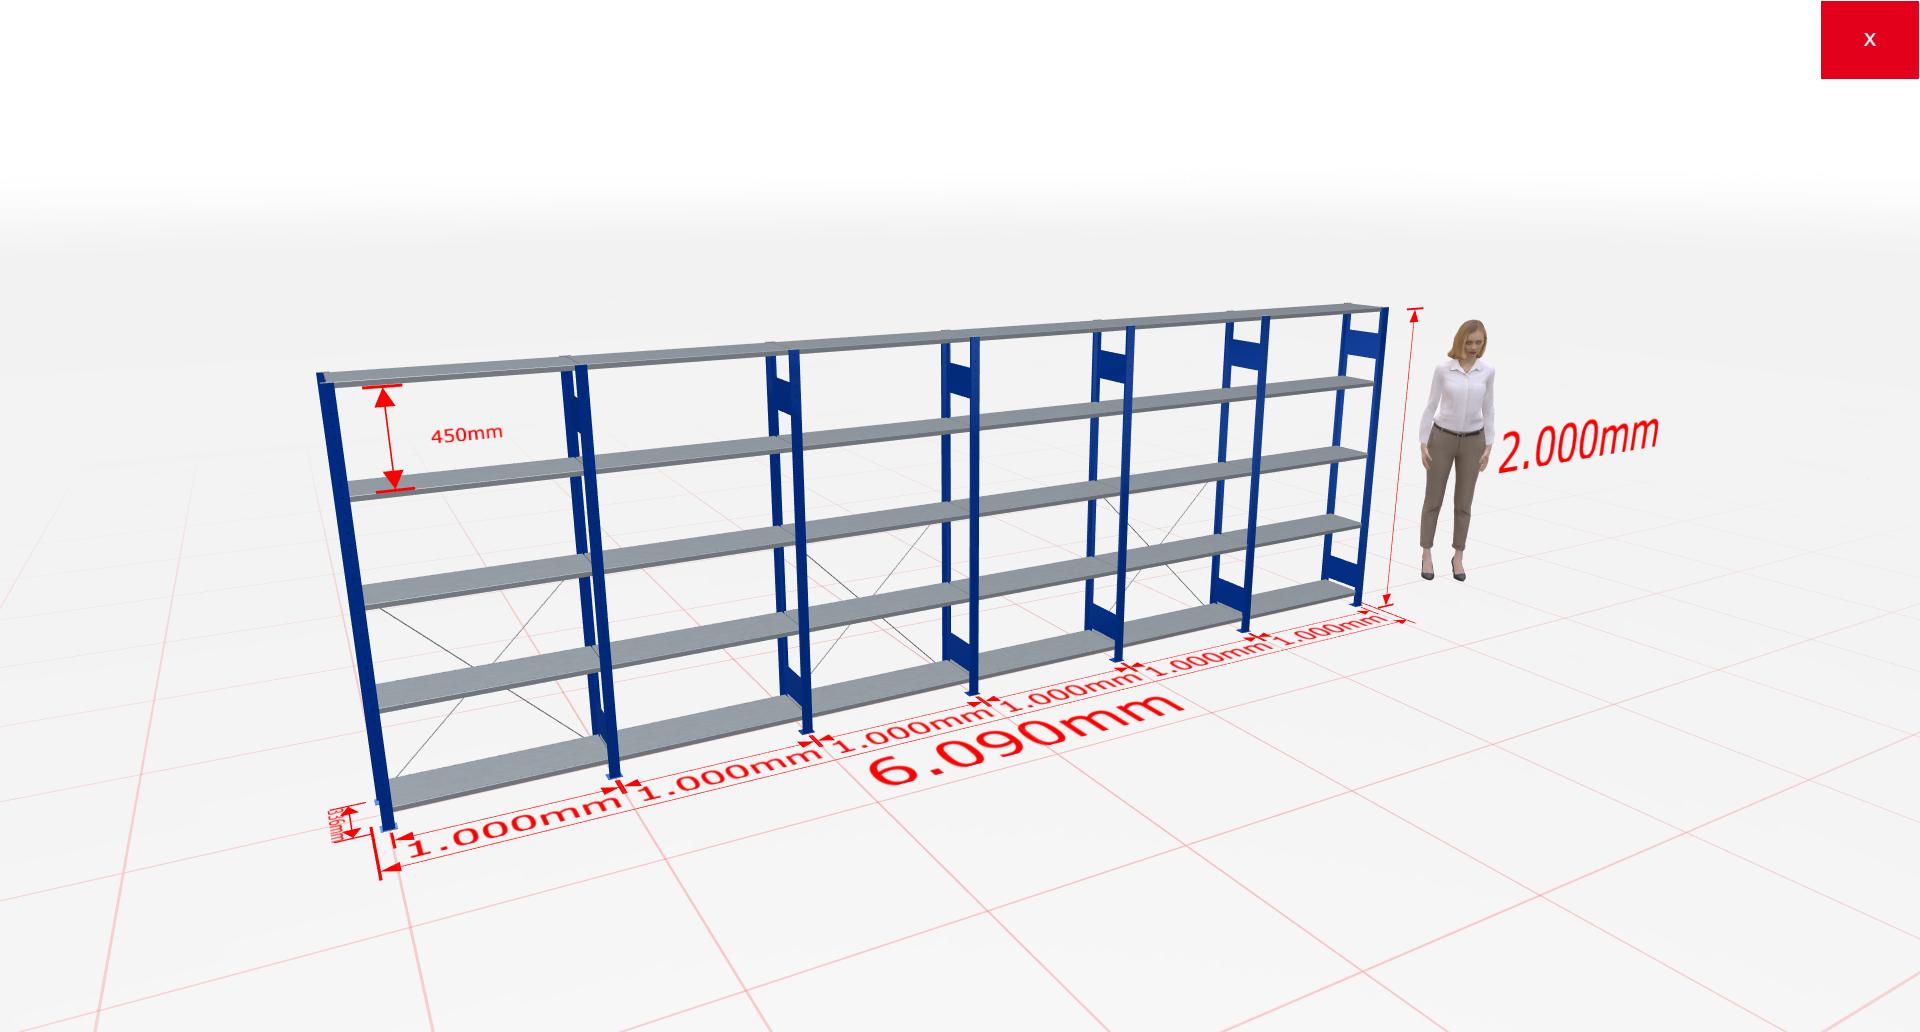 Fachbodenregal Komplettregal 2000x6090x300 mm (HxBxT) SCHULTE Lagertechnik blau 5 Ebenen  150 kg je Boden